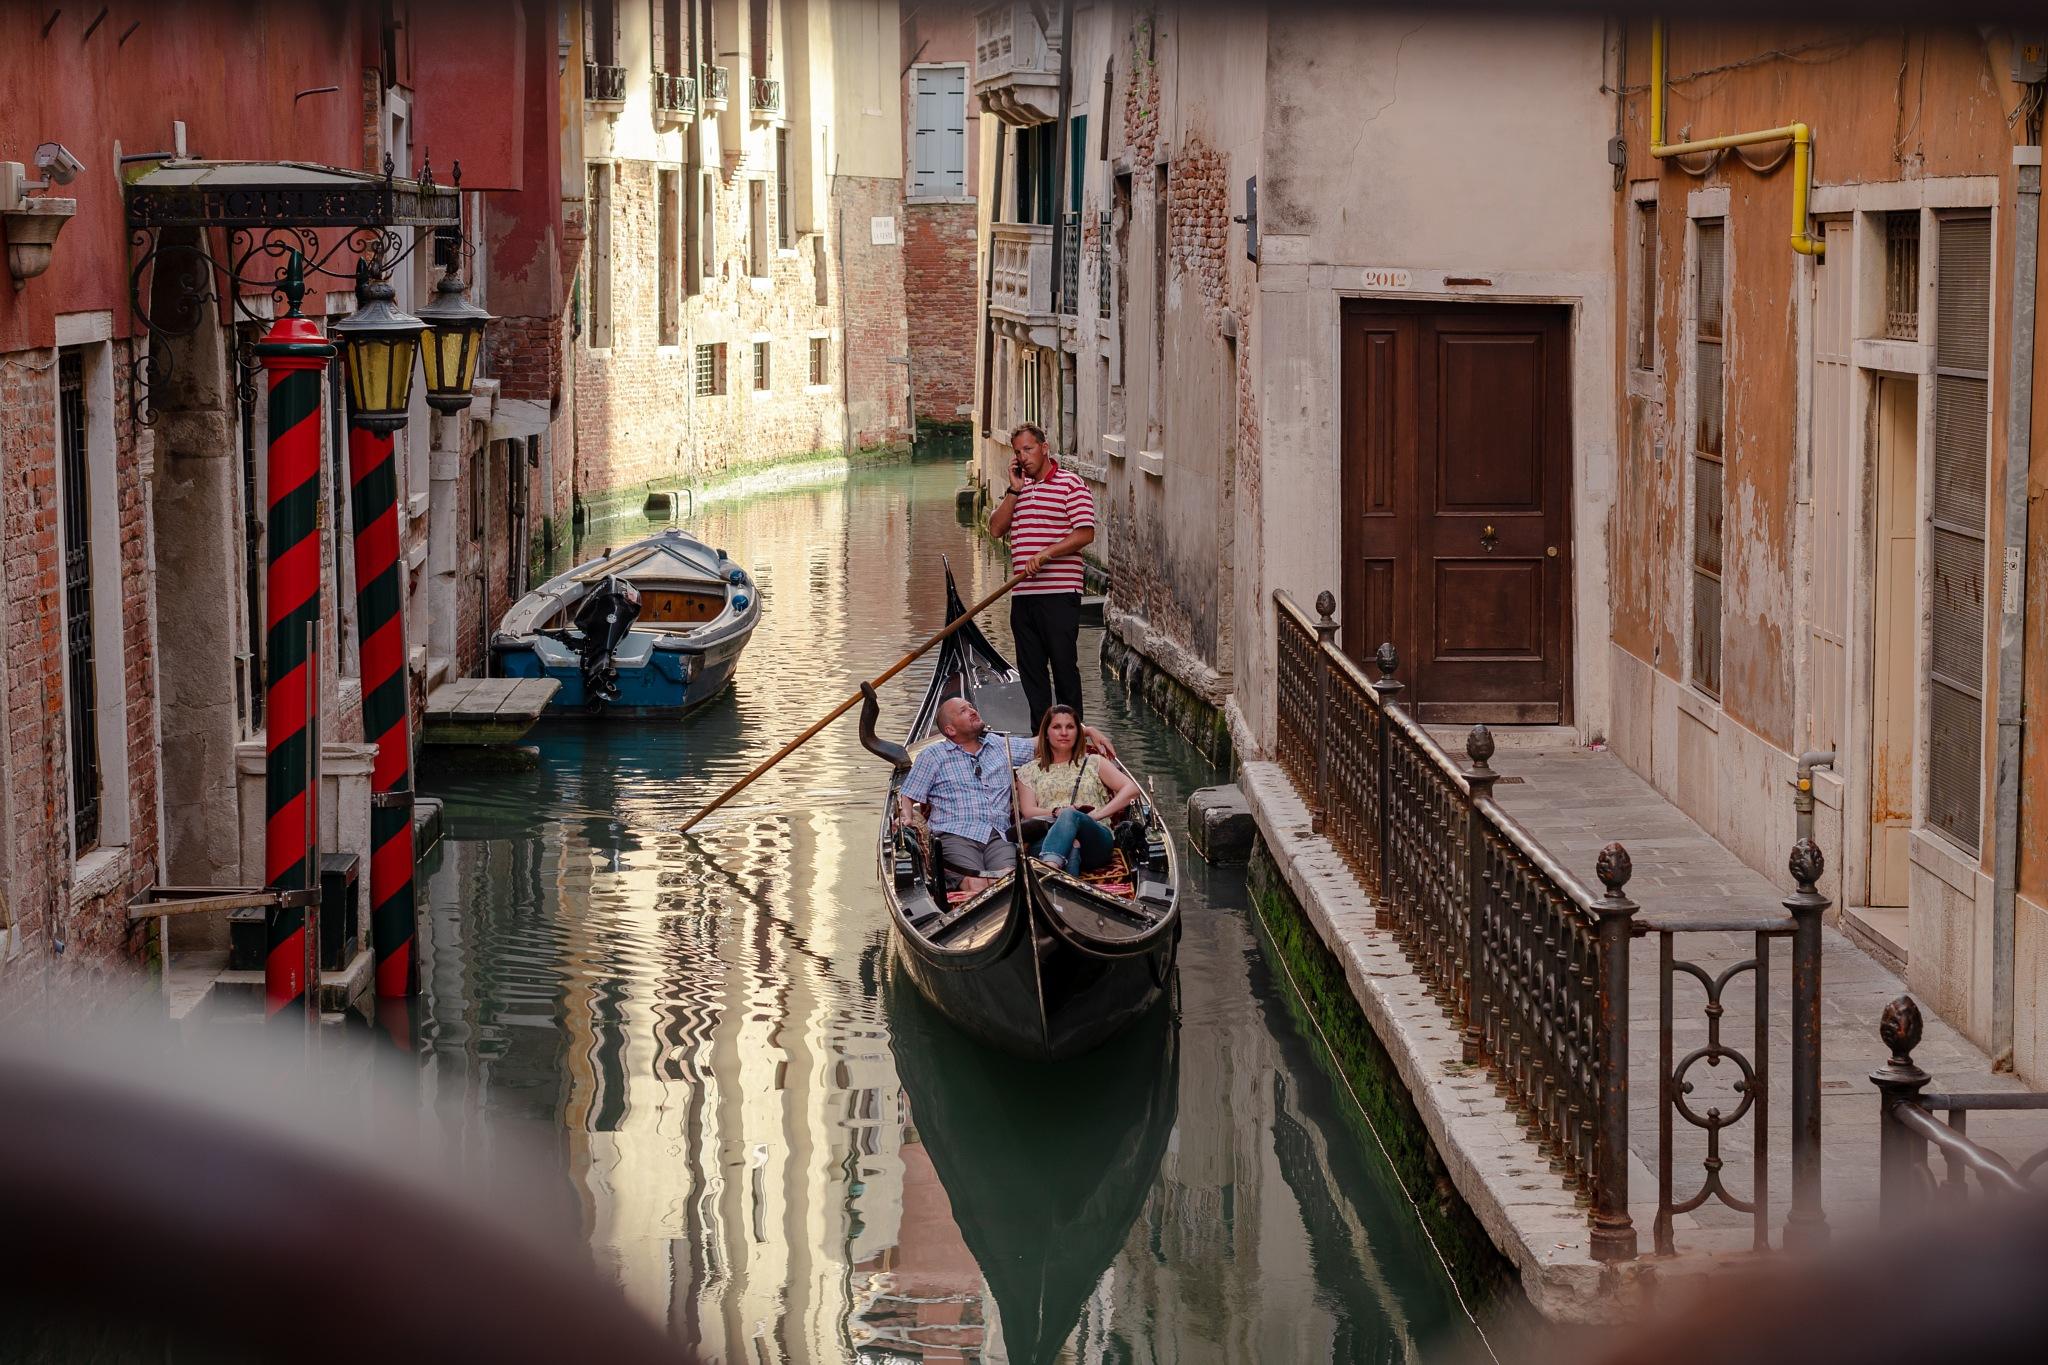 Gondola ride  by aliensfashion